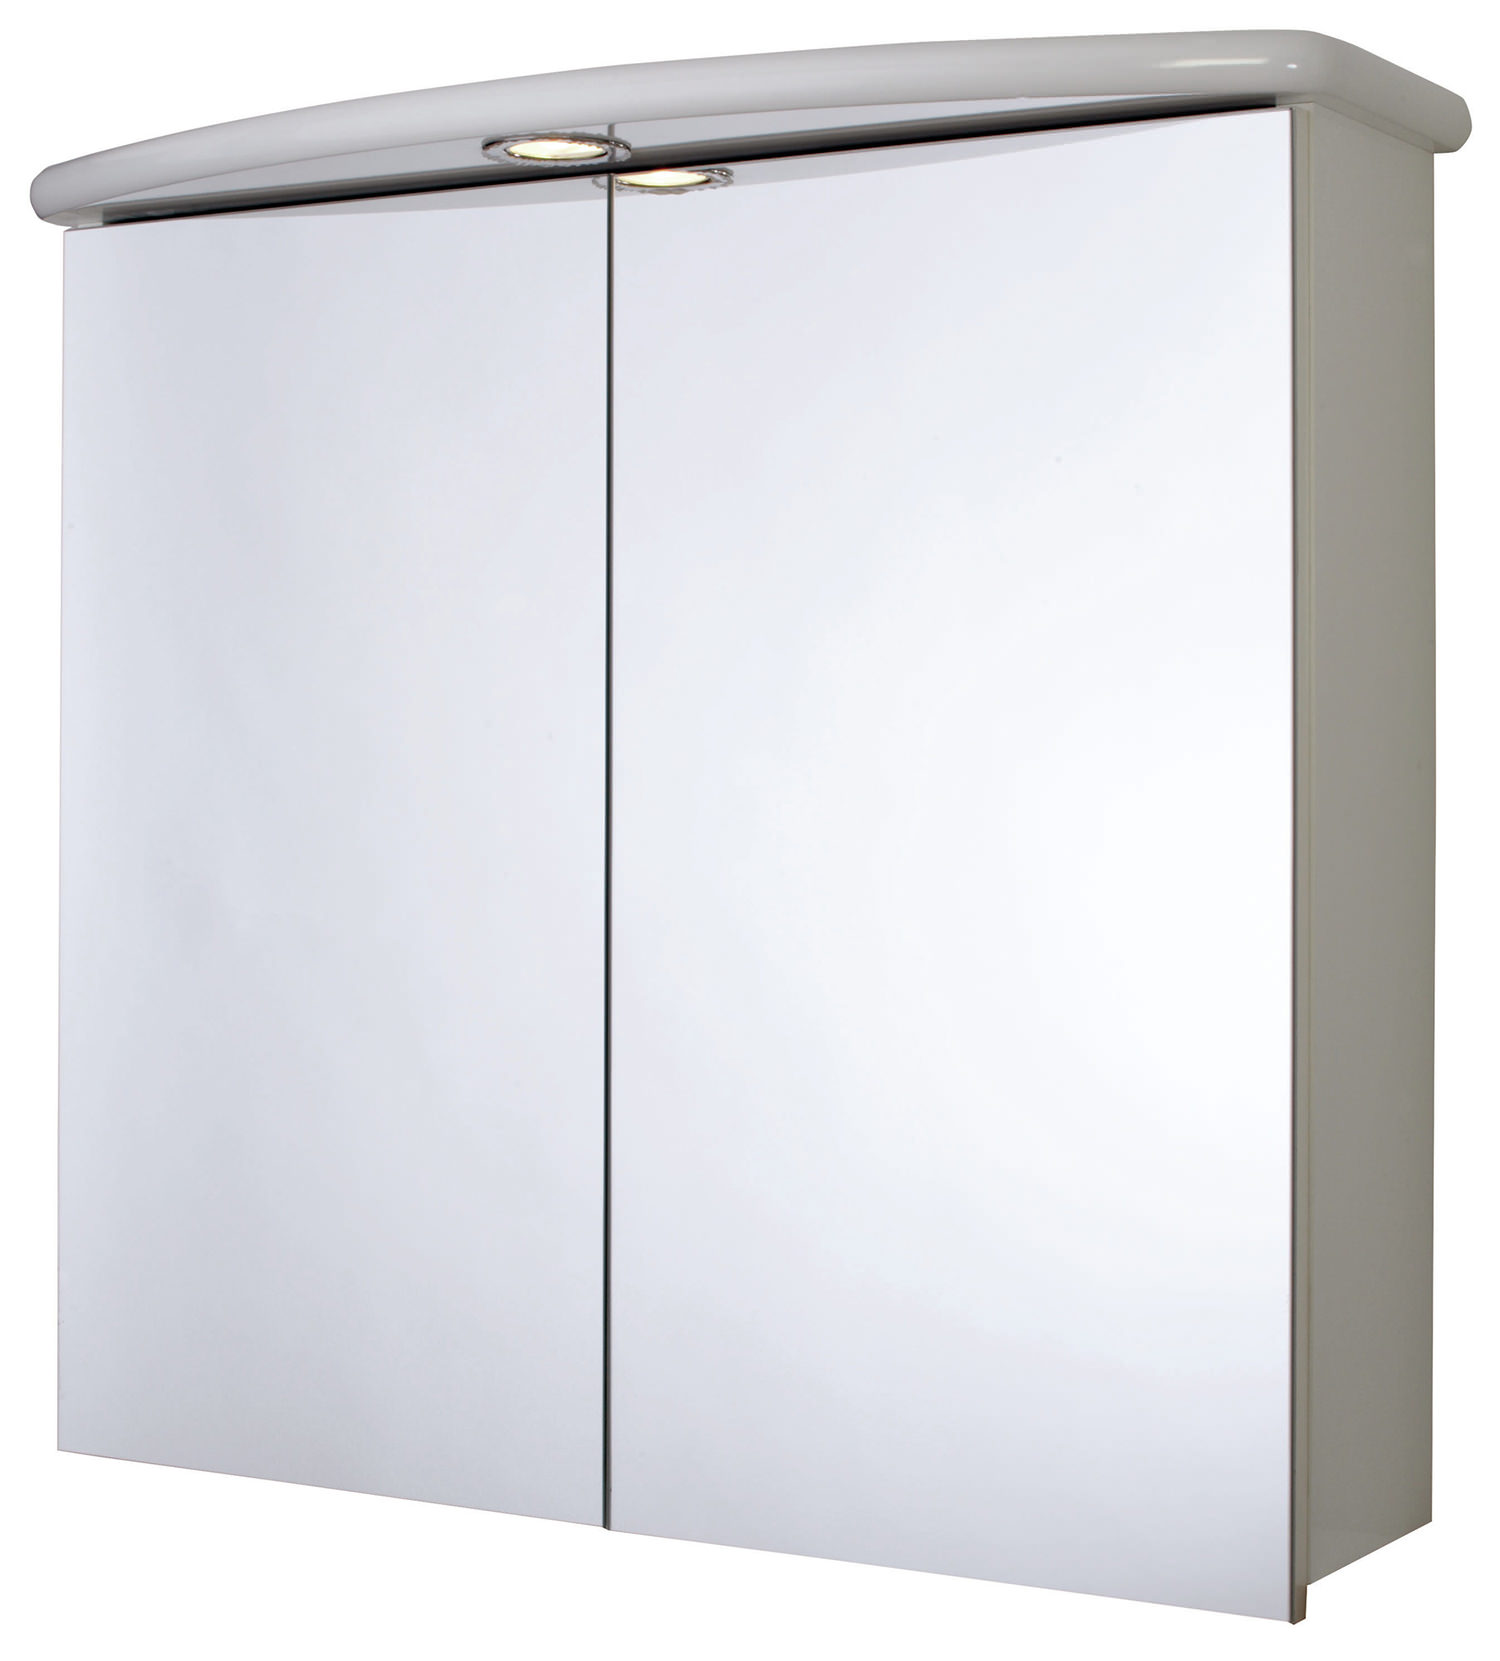 Croydex thames double door illuminated mirror cabinet wc146122e for Double door mirrored bathroom cabinet